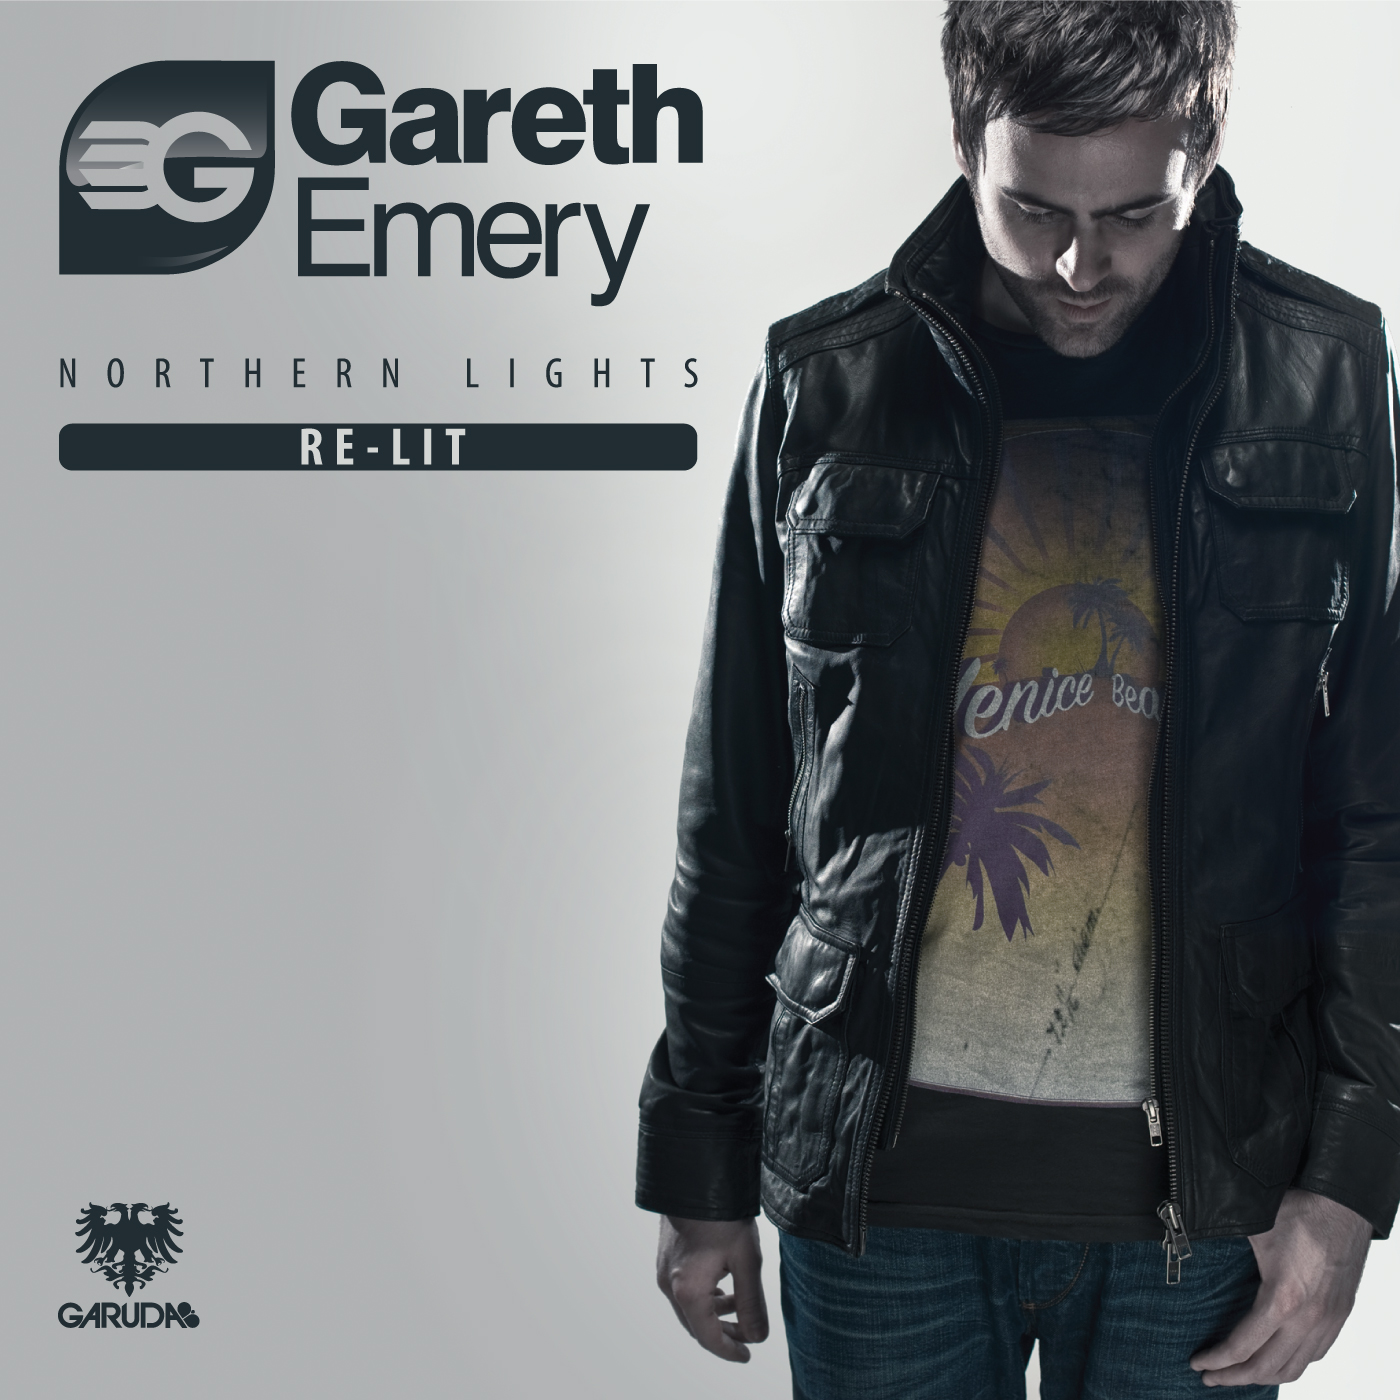 Gareth emery northern lights by gareth emery amazon. Com music.